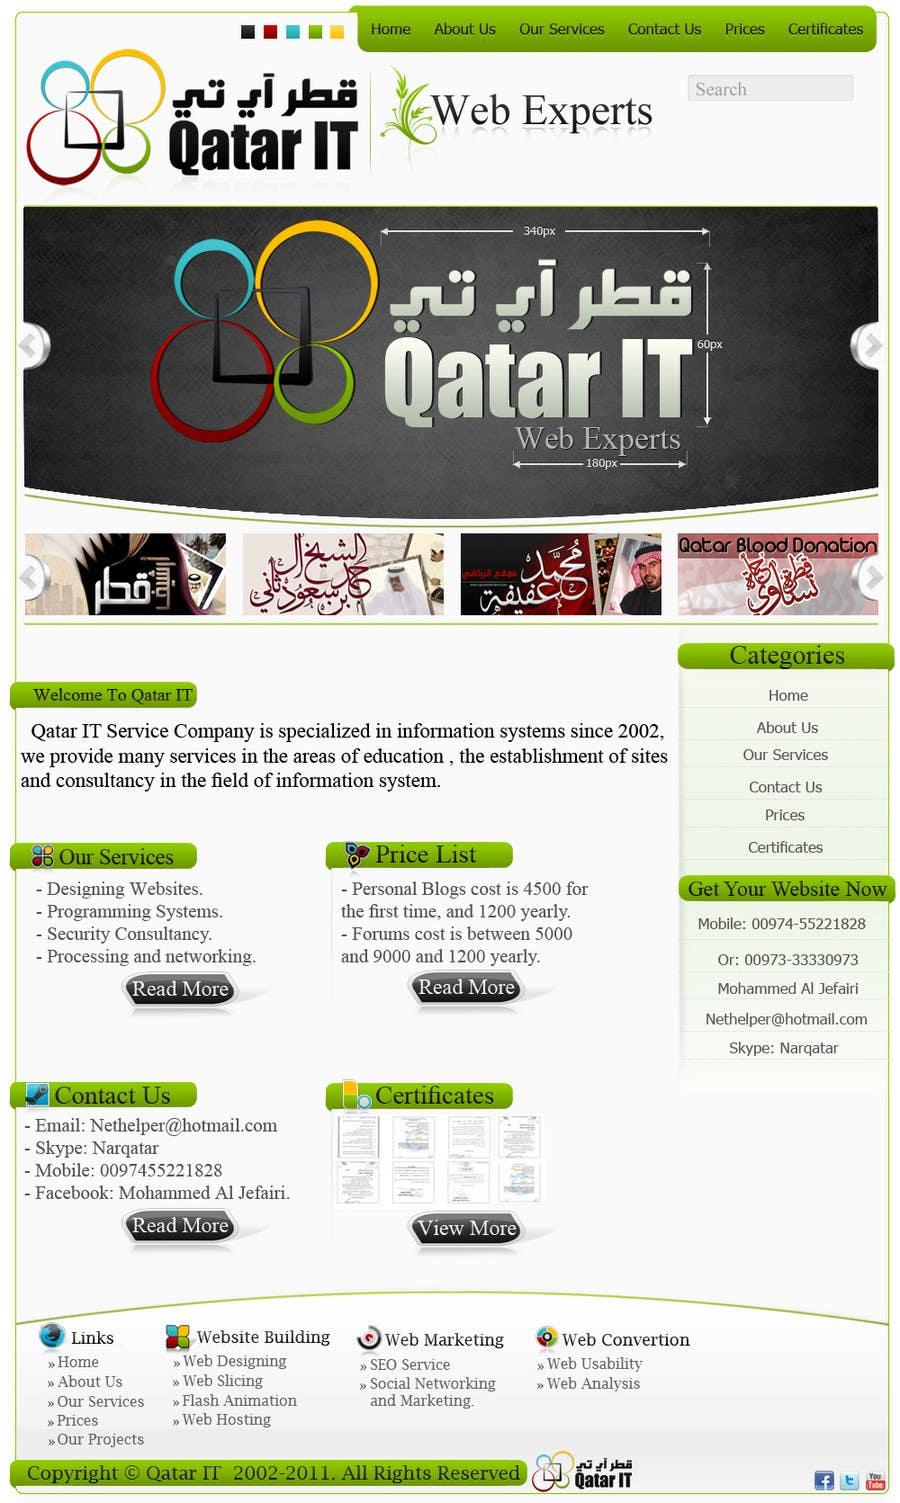 Bài tham dự cuộc thi #                                        96                                      cho                                         Website Design for Qatar IT